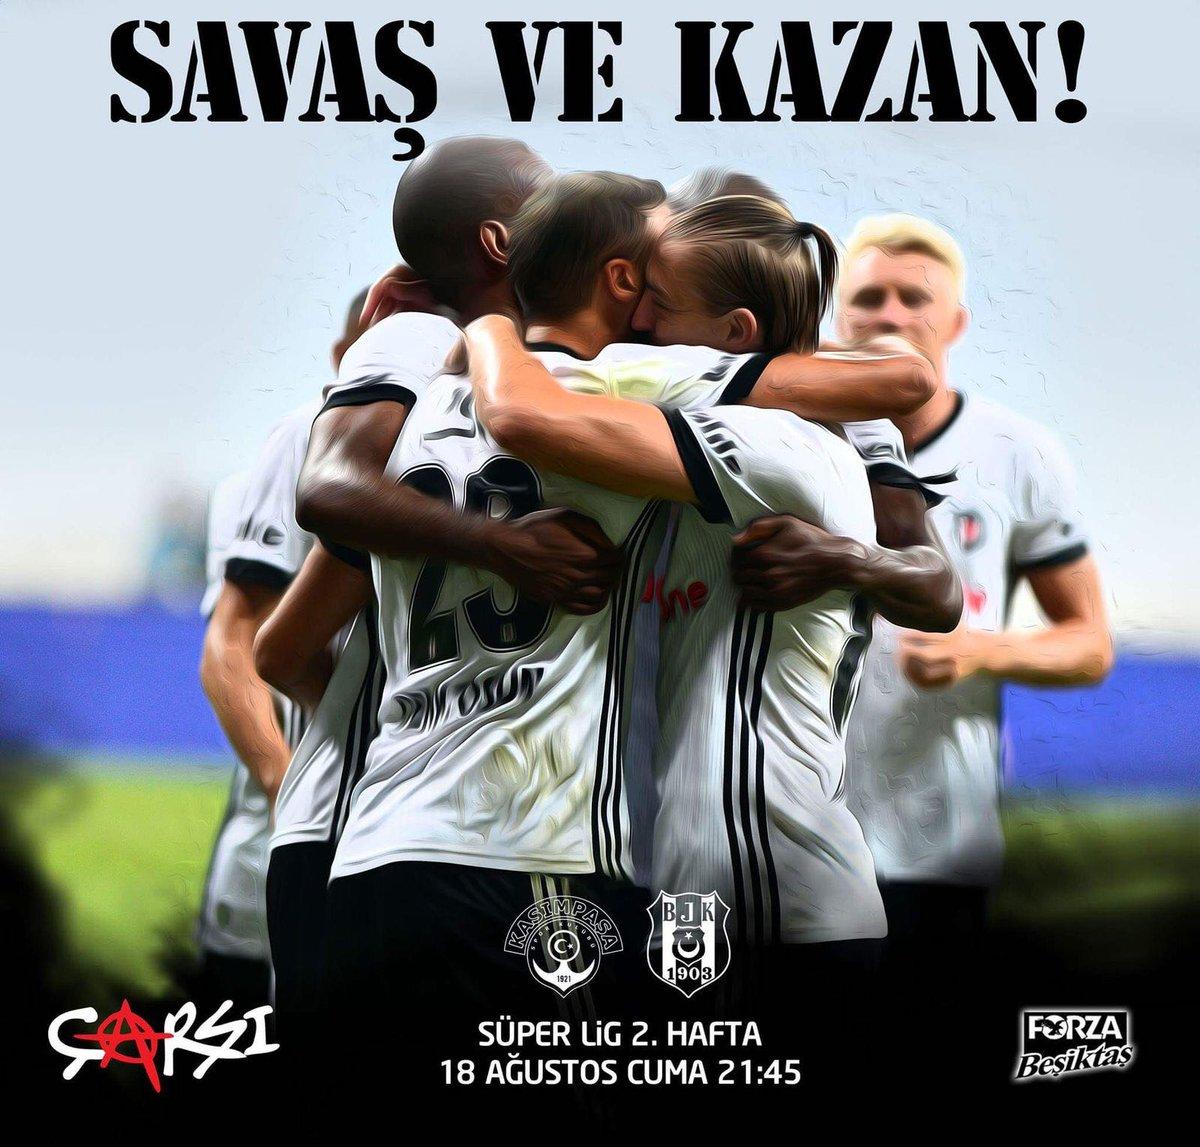 la vittoria sara nostra #Beşiktaş #ZafereKanatlan #BeşiktaşınMaçıVar h...